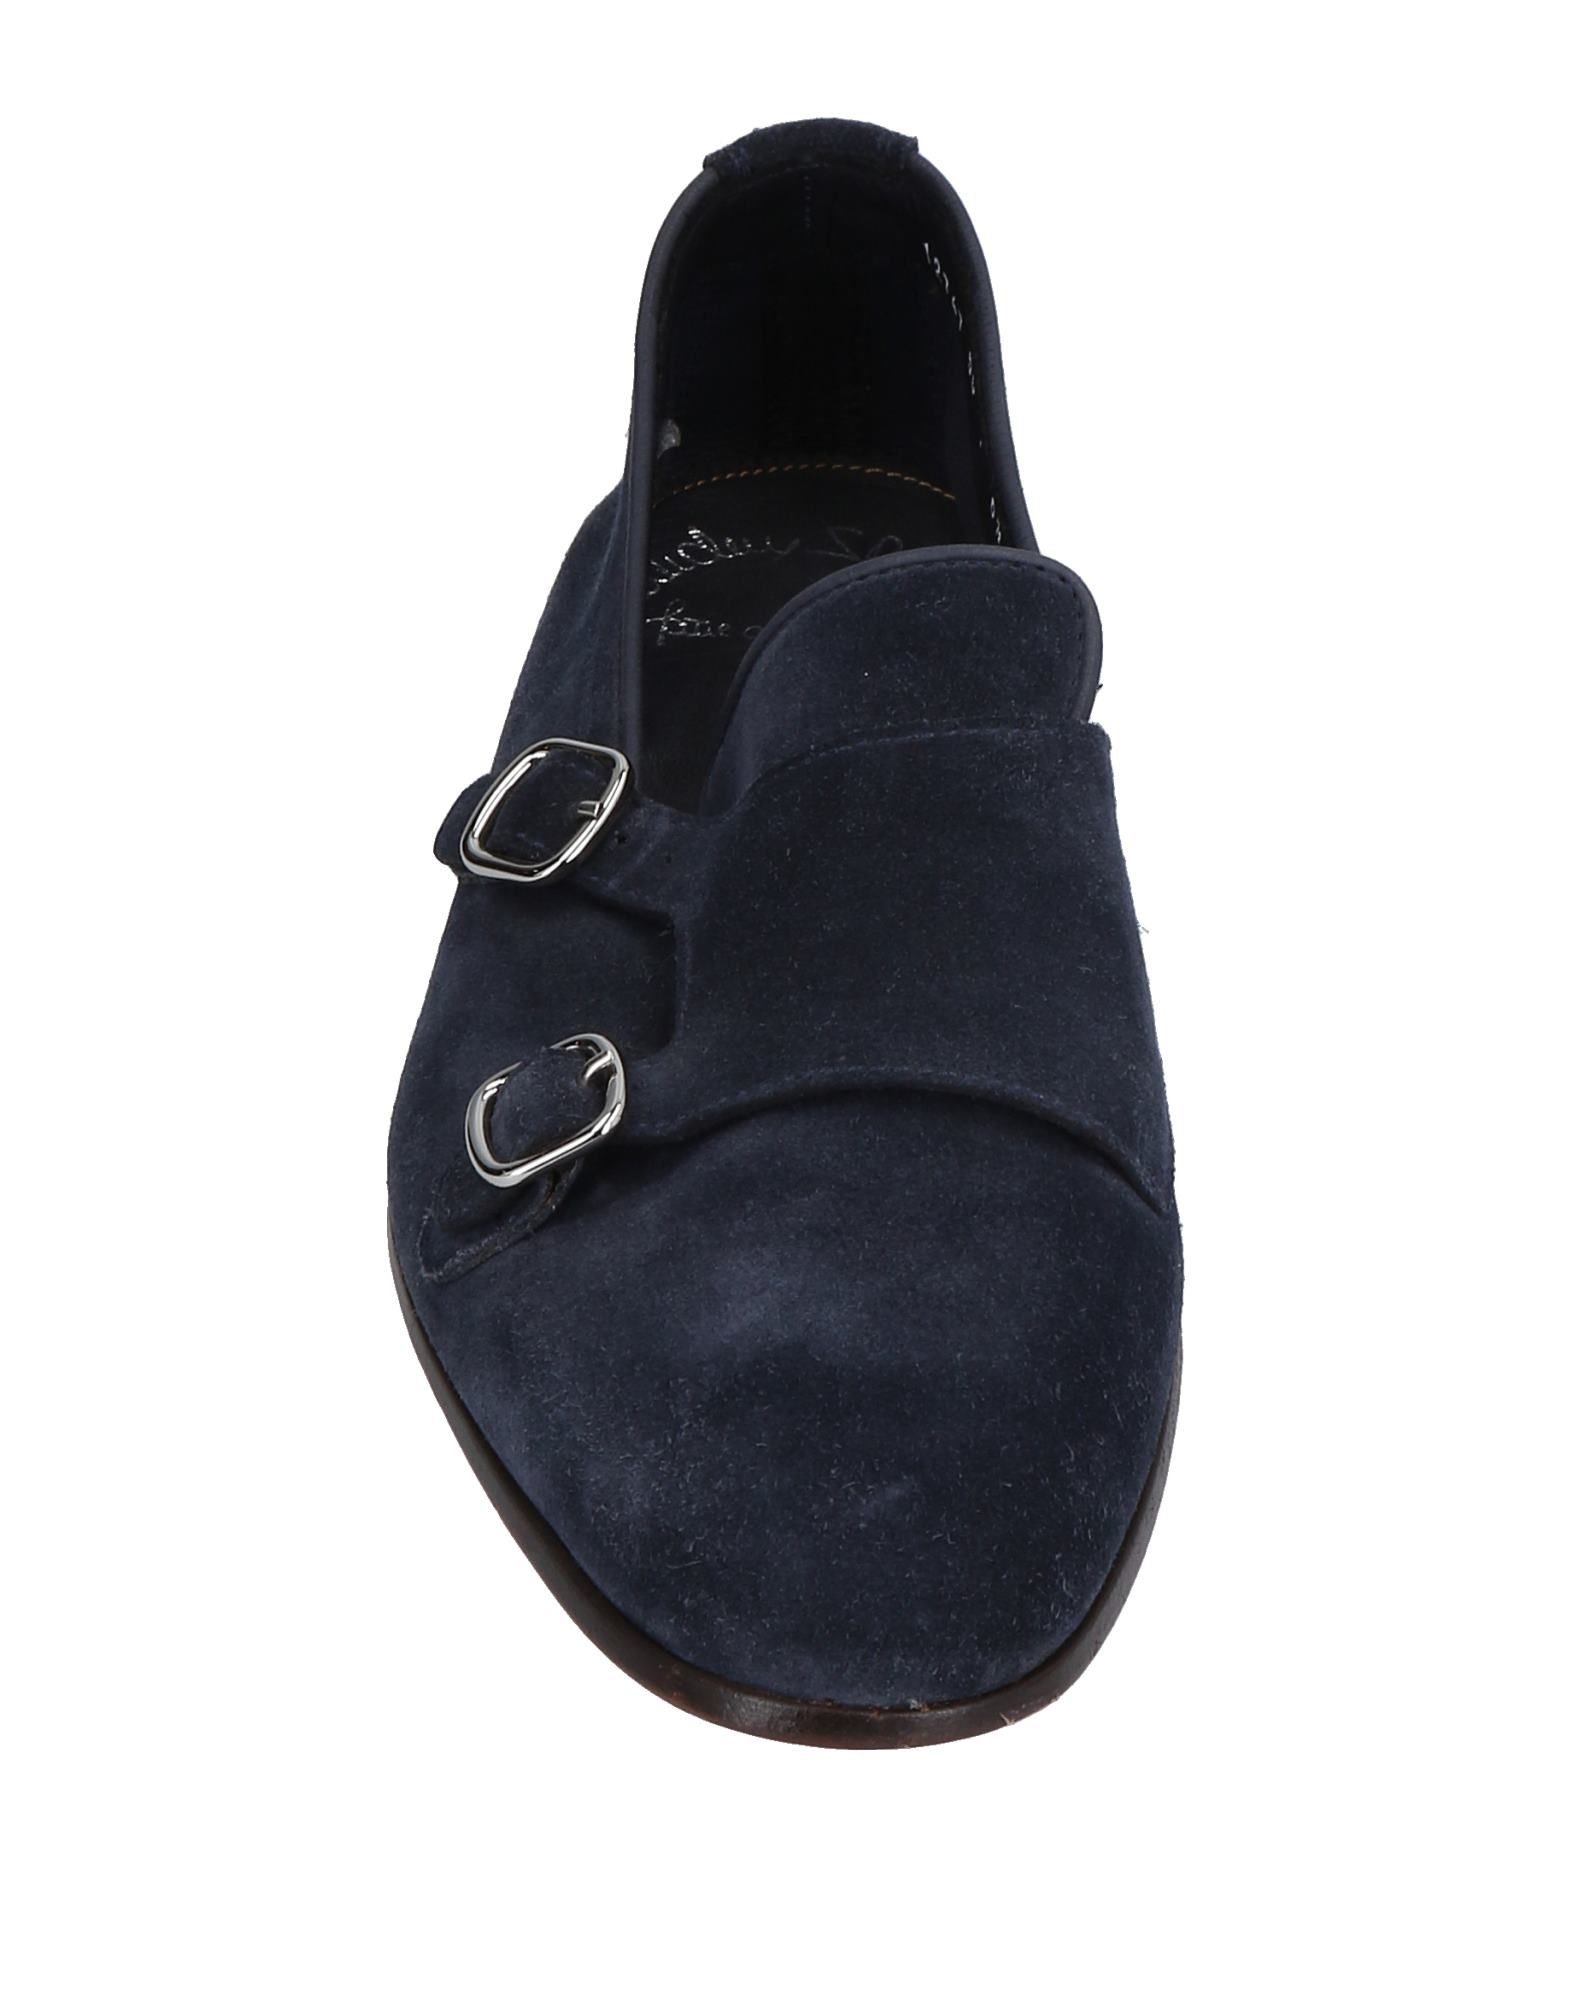 Santoni Santoni Santoni Mokassins Herren  11519630PF Heiße Schuhe aa5912